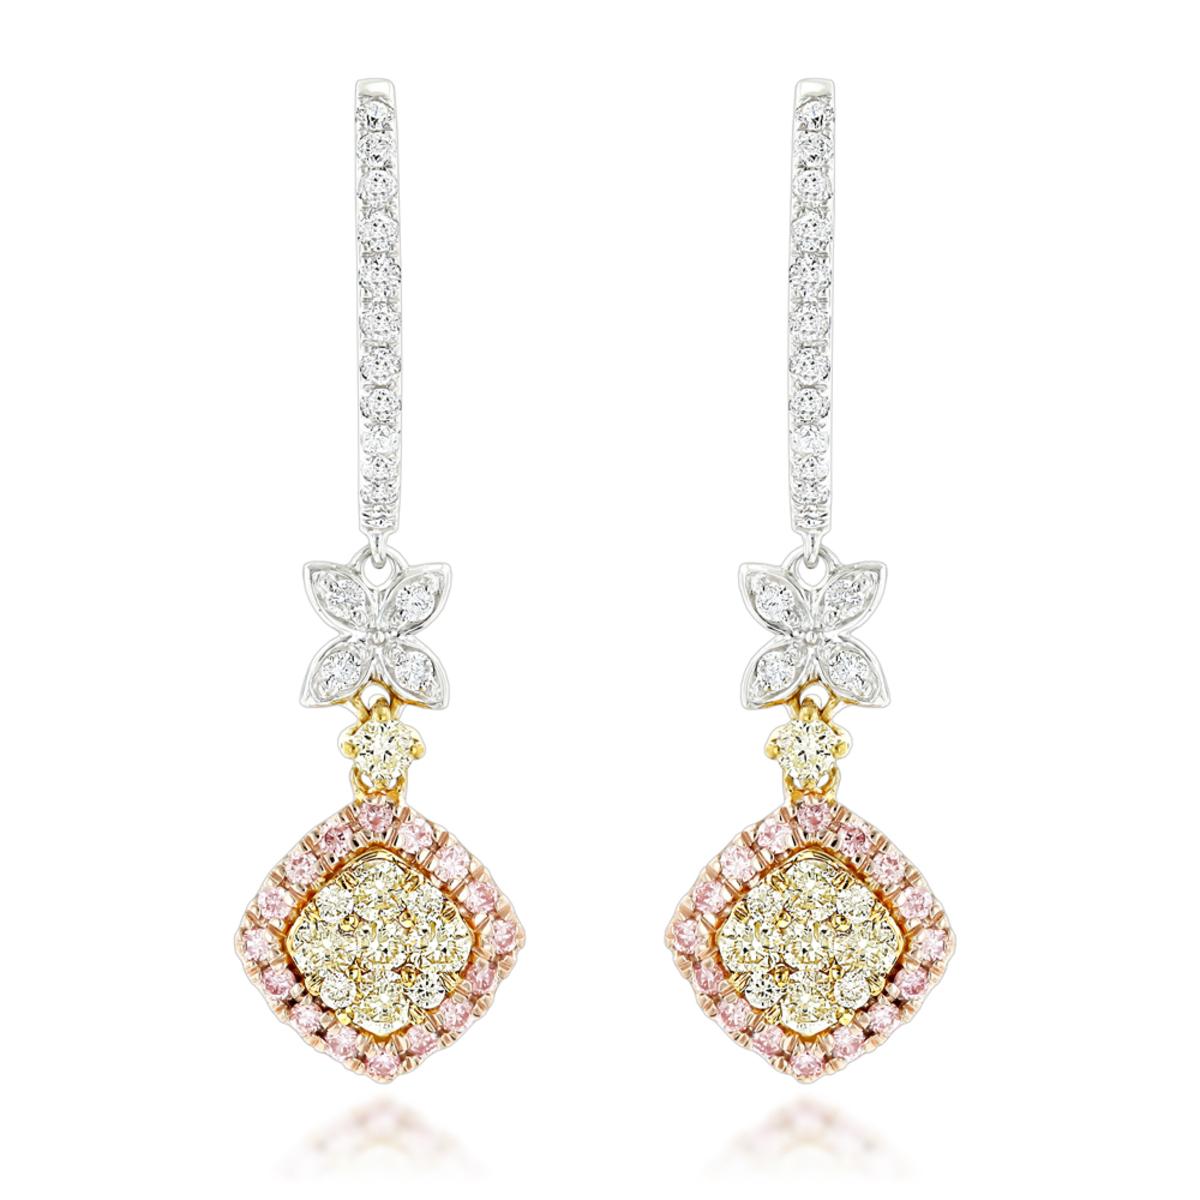 Luxurman White Yellow Pink Diamond Drop Earrings for Women 1.4ct 14K Gold